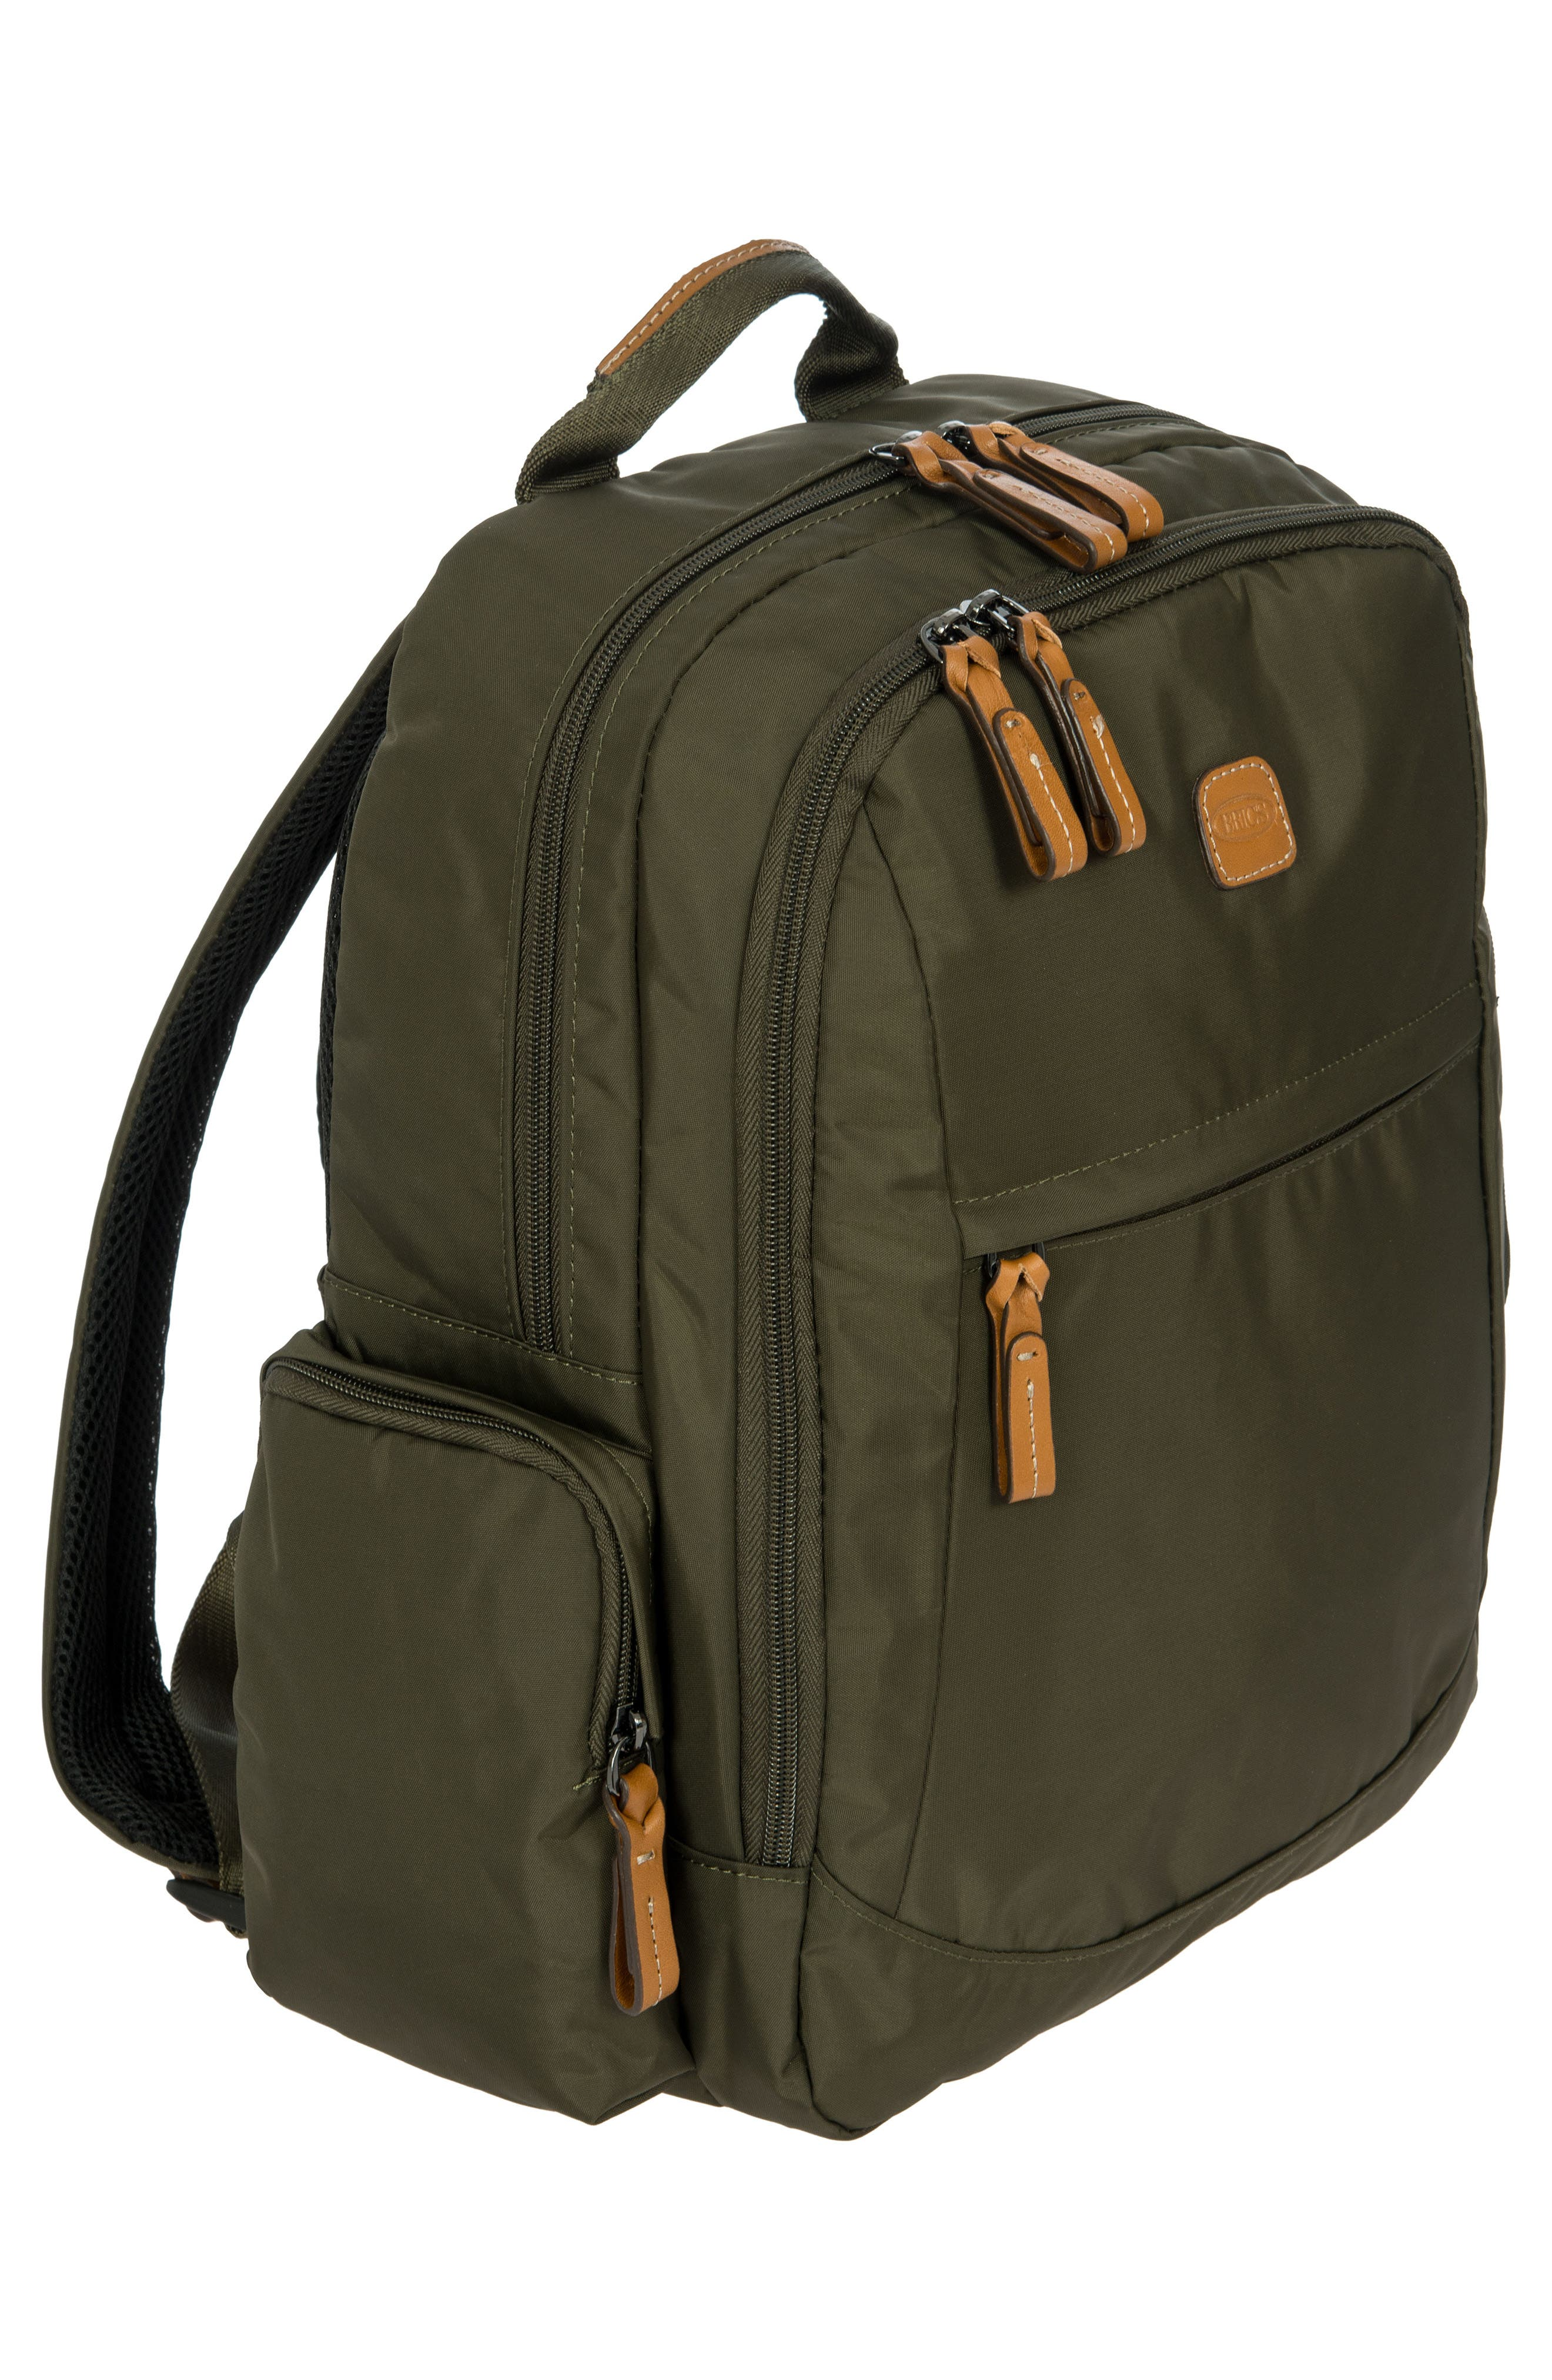 X-Travel Nomad Backpack,                             Alternate thumbnail 6, color,                             Olive